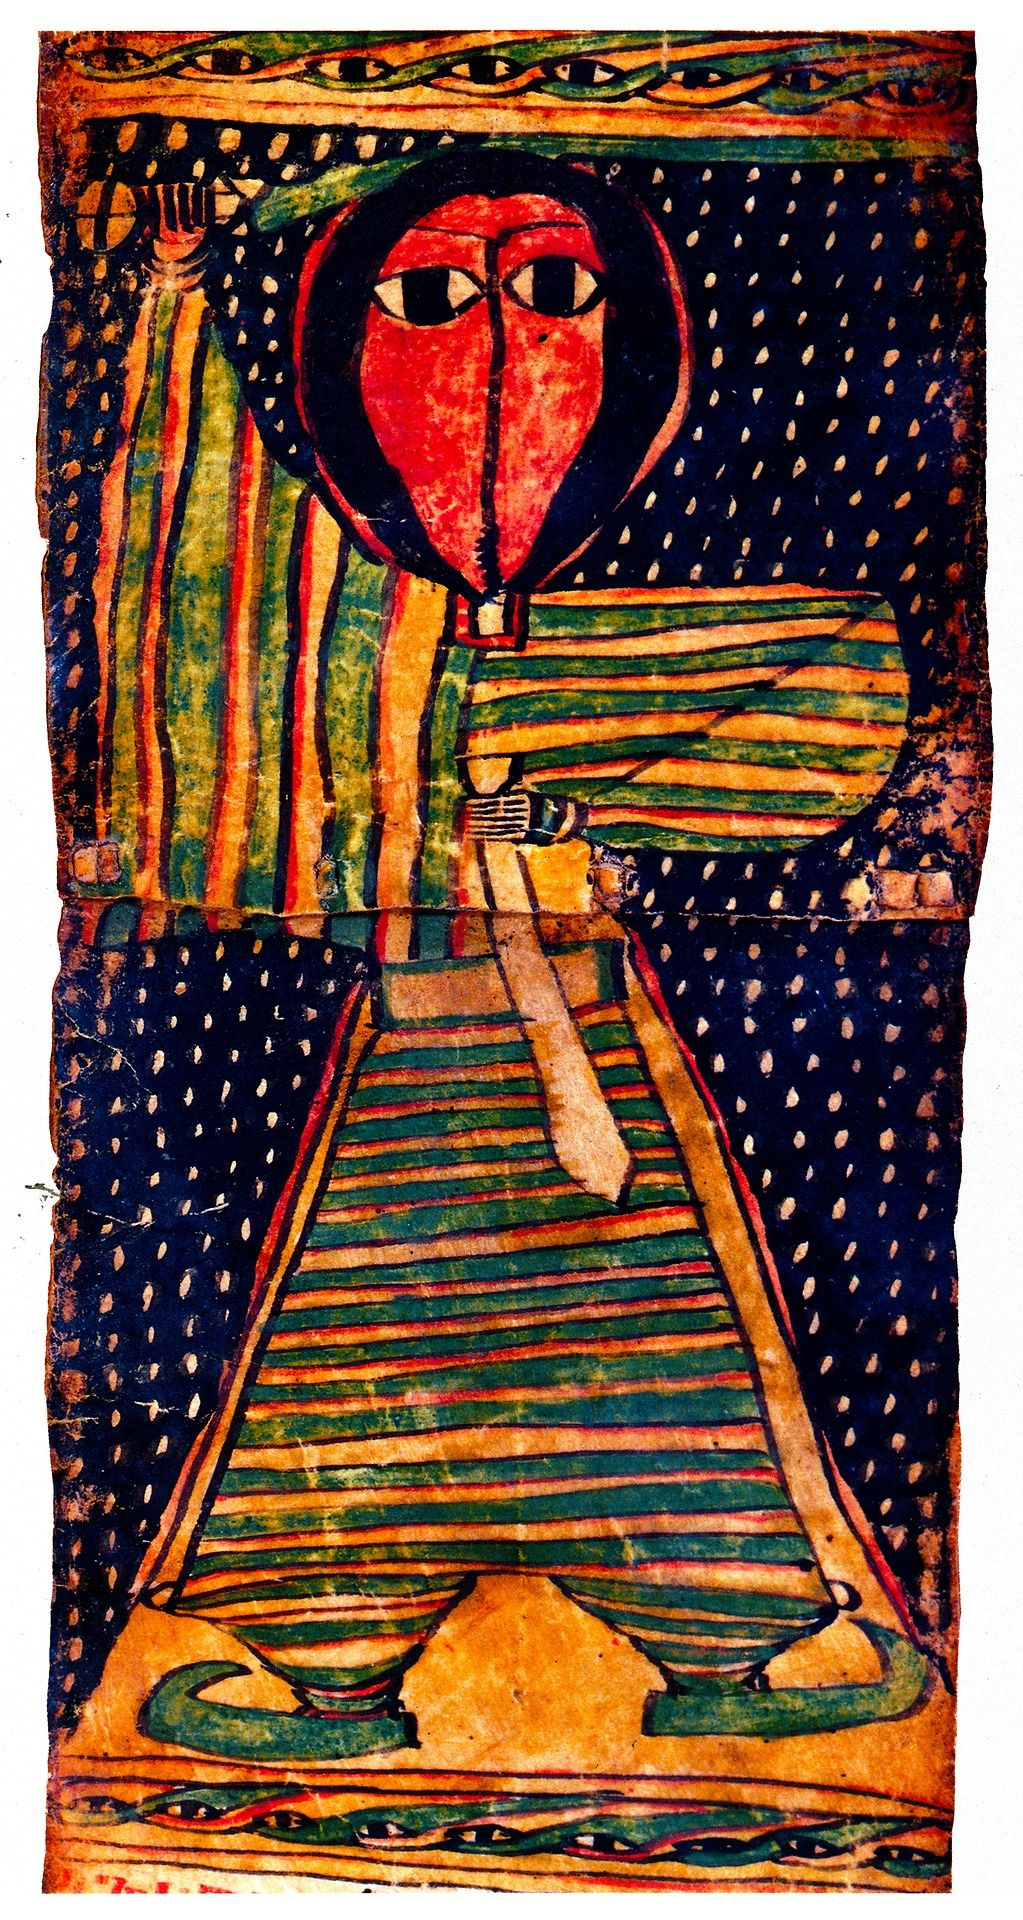 ethiopian magic scrolls art things pinterest african art ethiopian magic scrolls